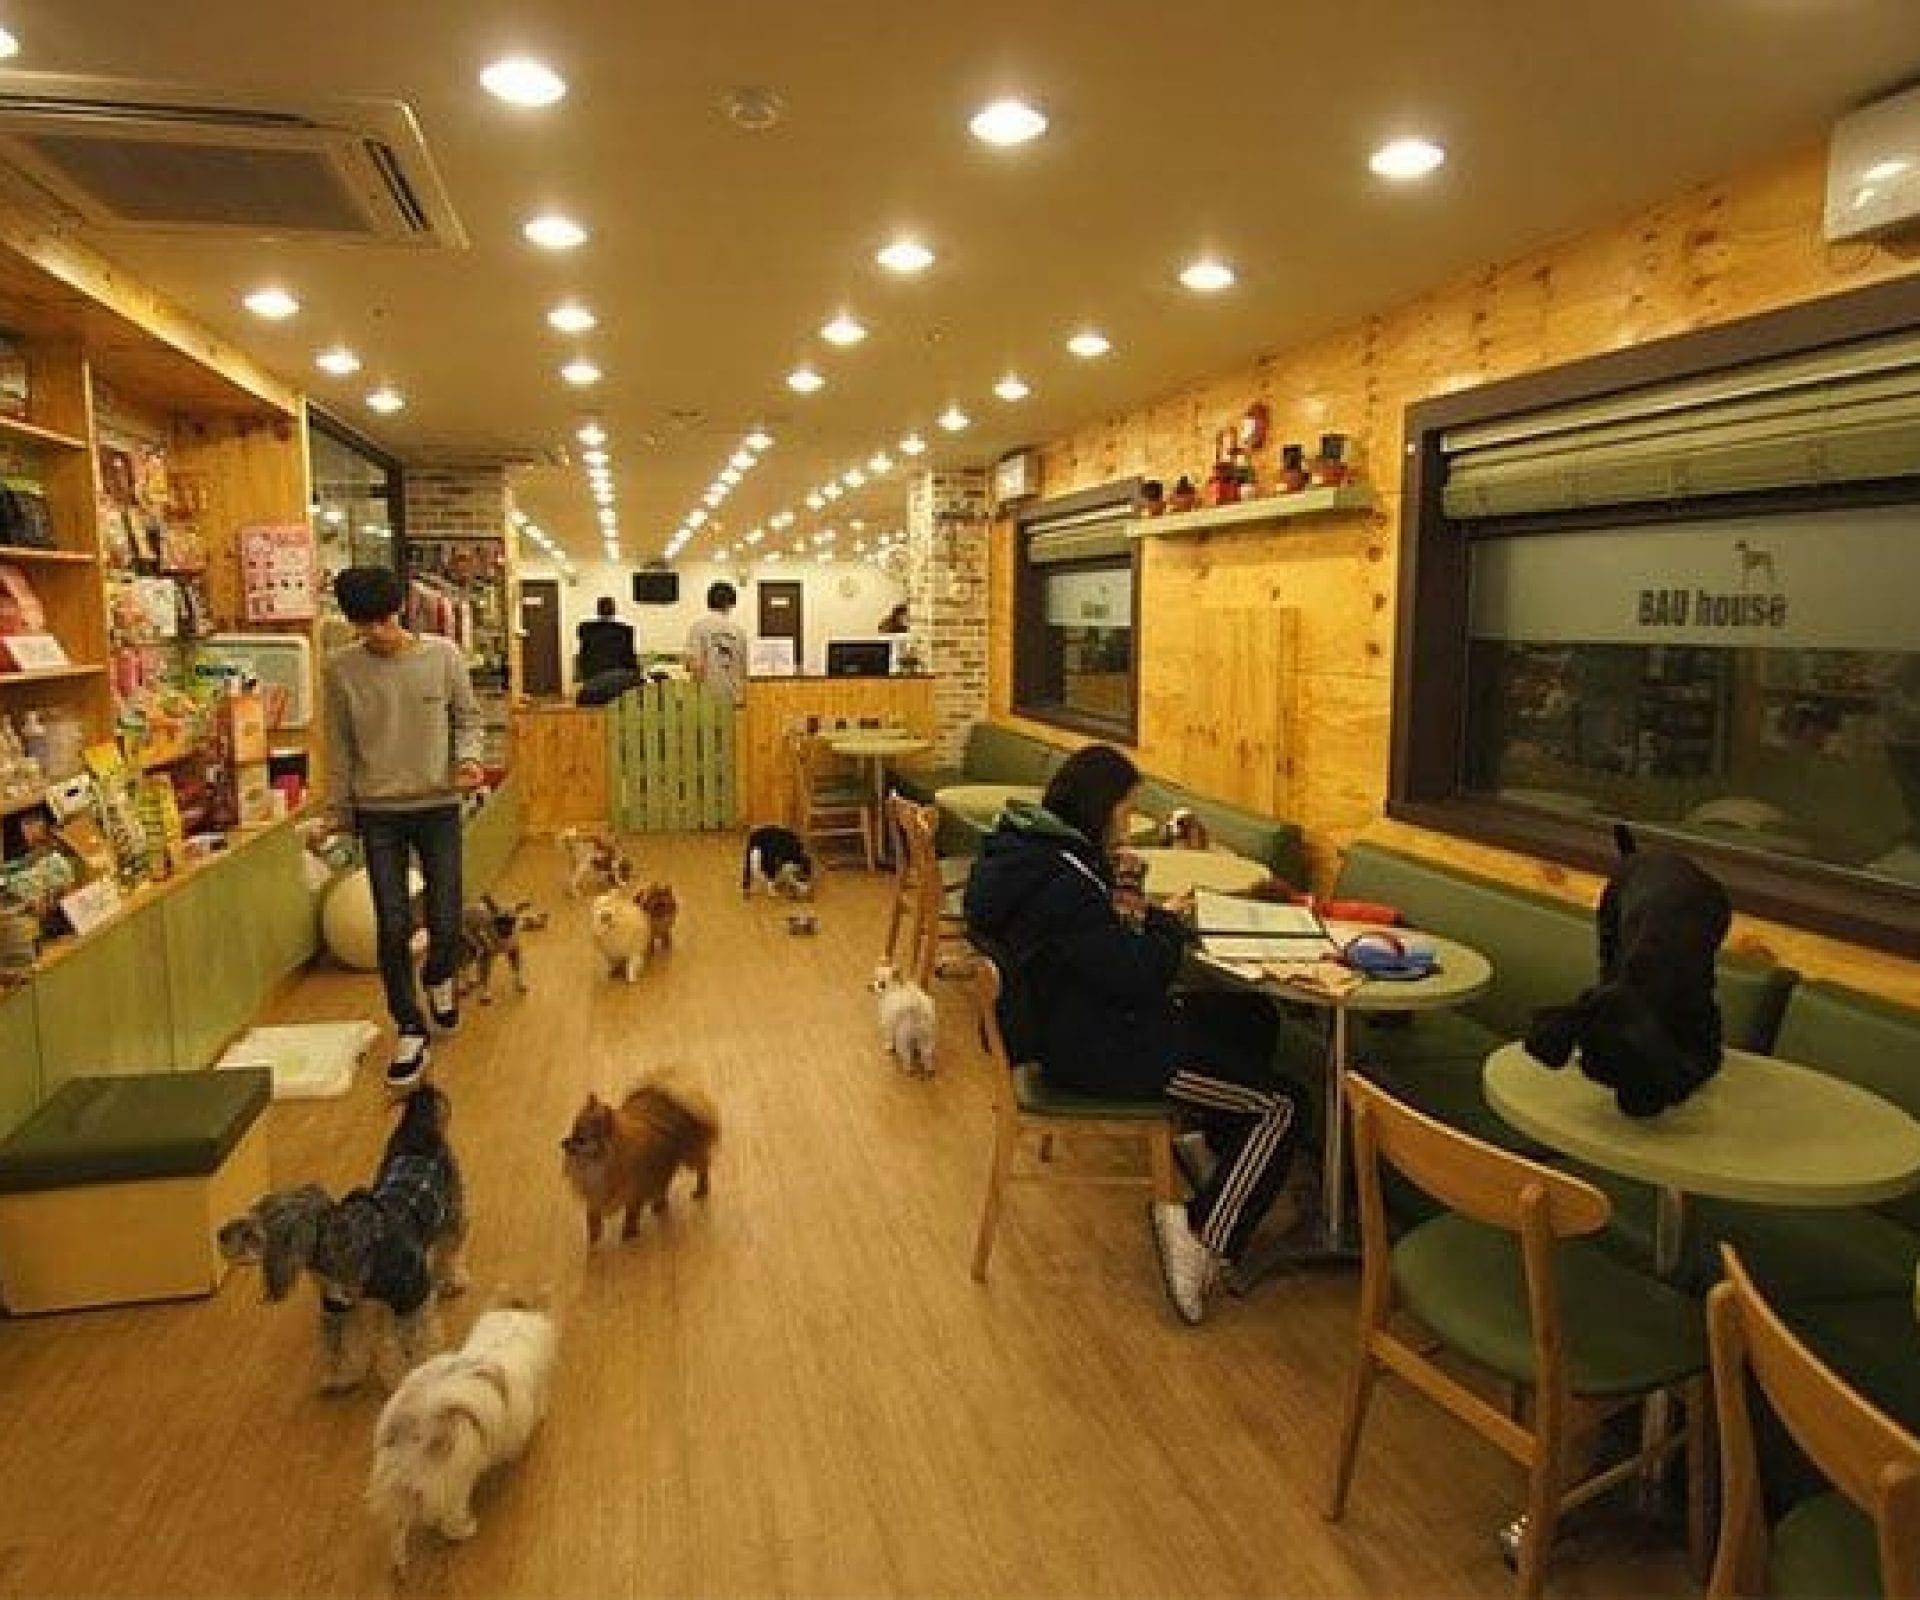 Bau House Dog Cafe   Mapo-gu, Seoul